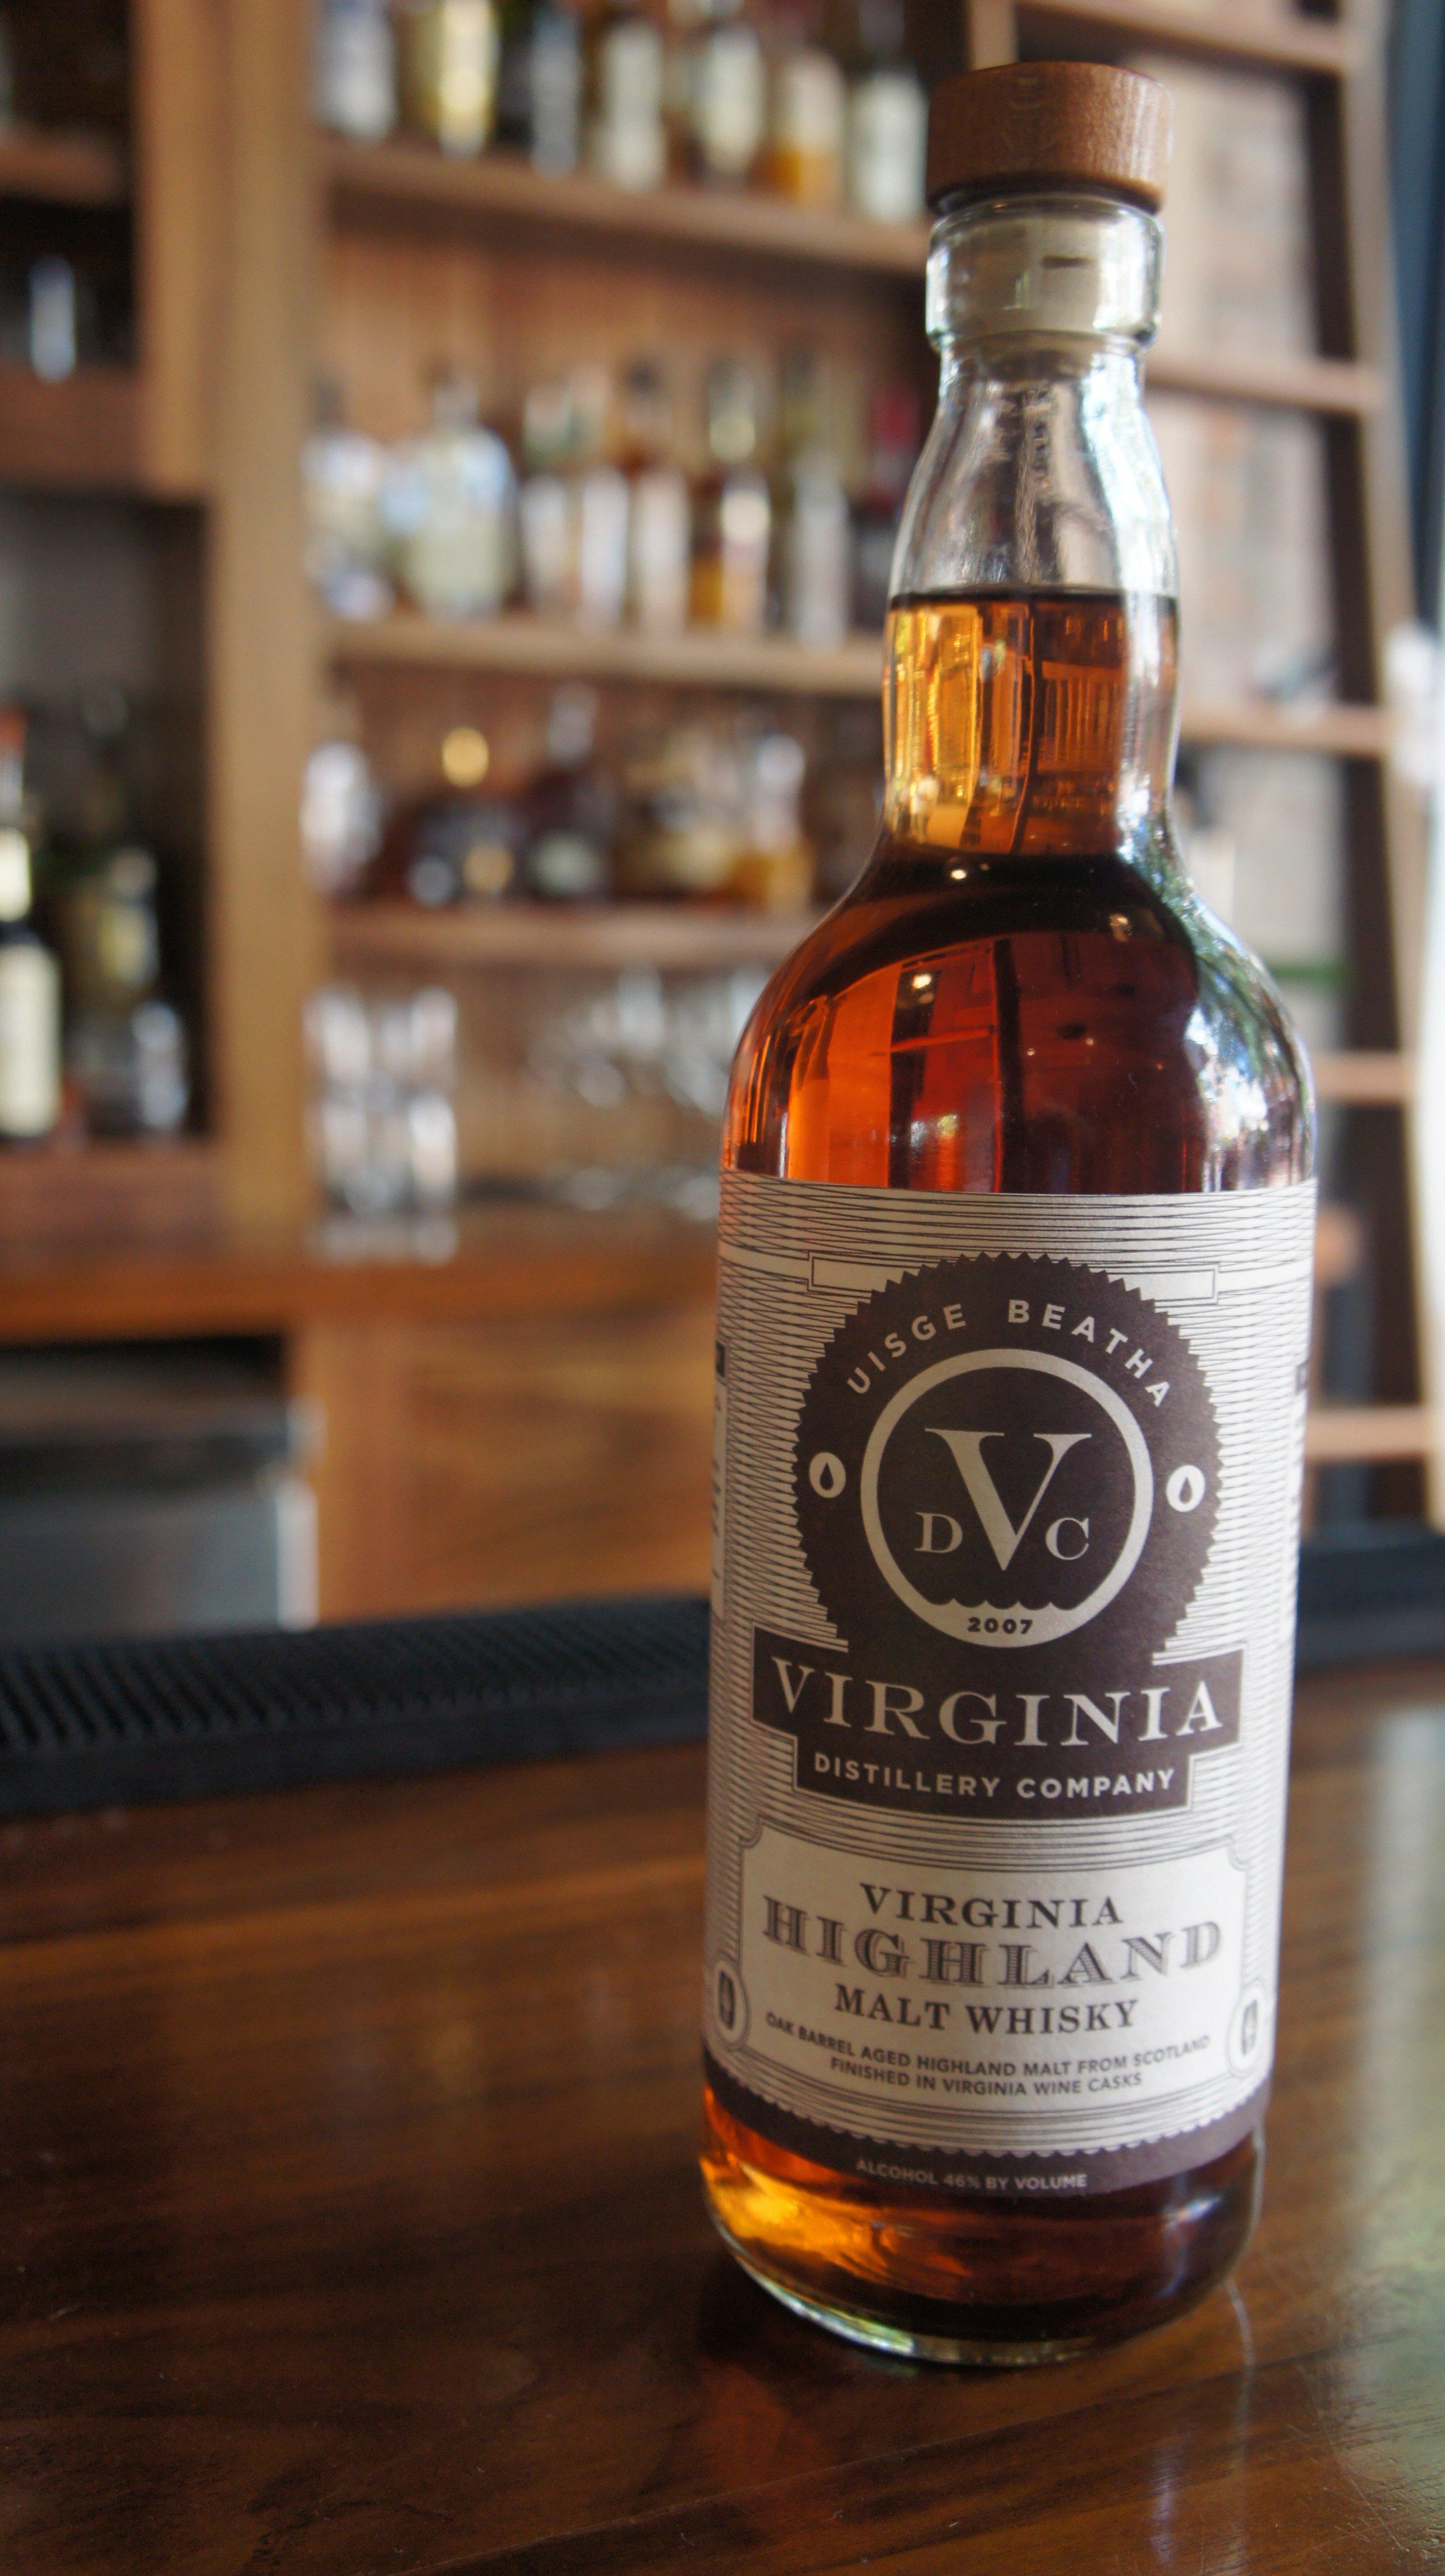 Virginia Distillery Virginia Highland Malt Whisky